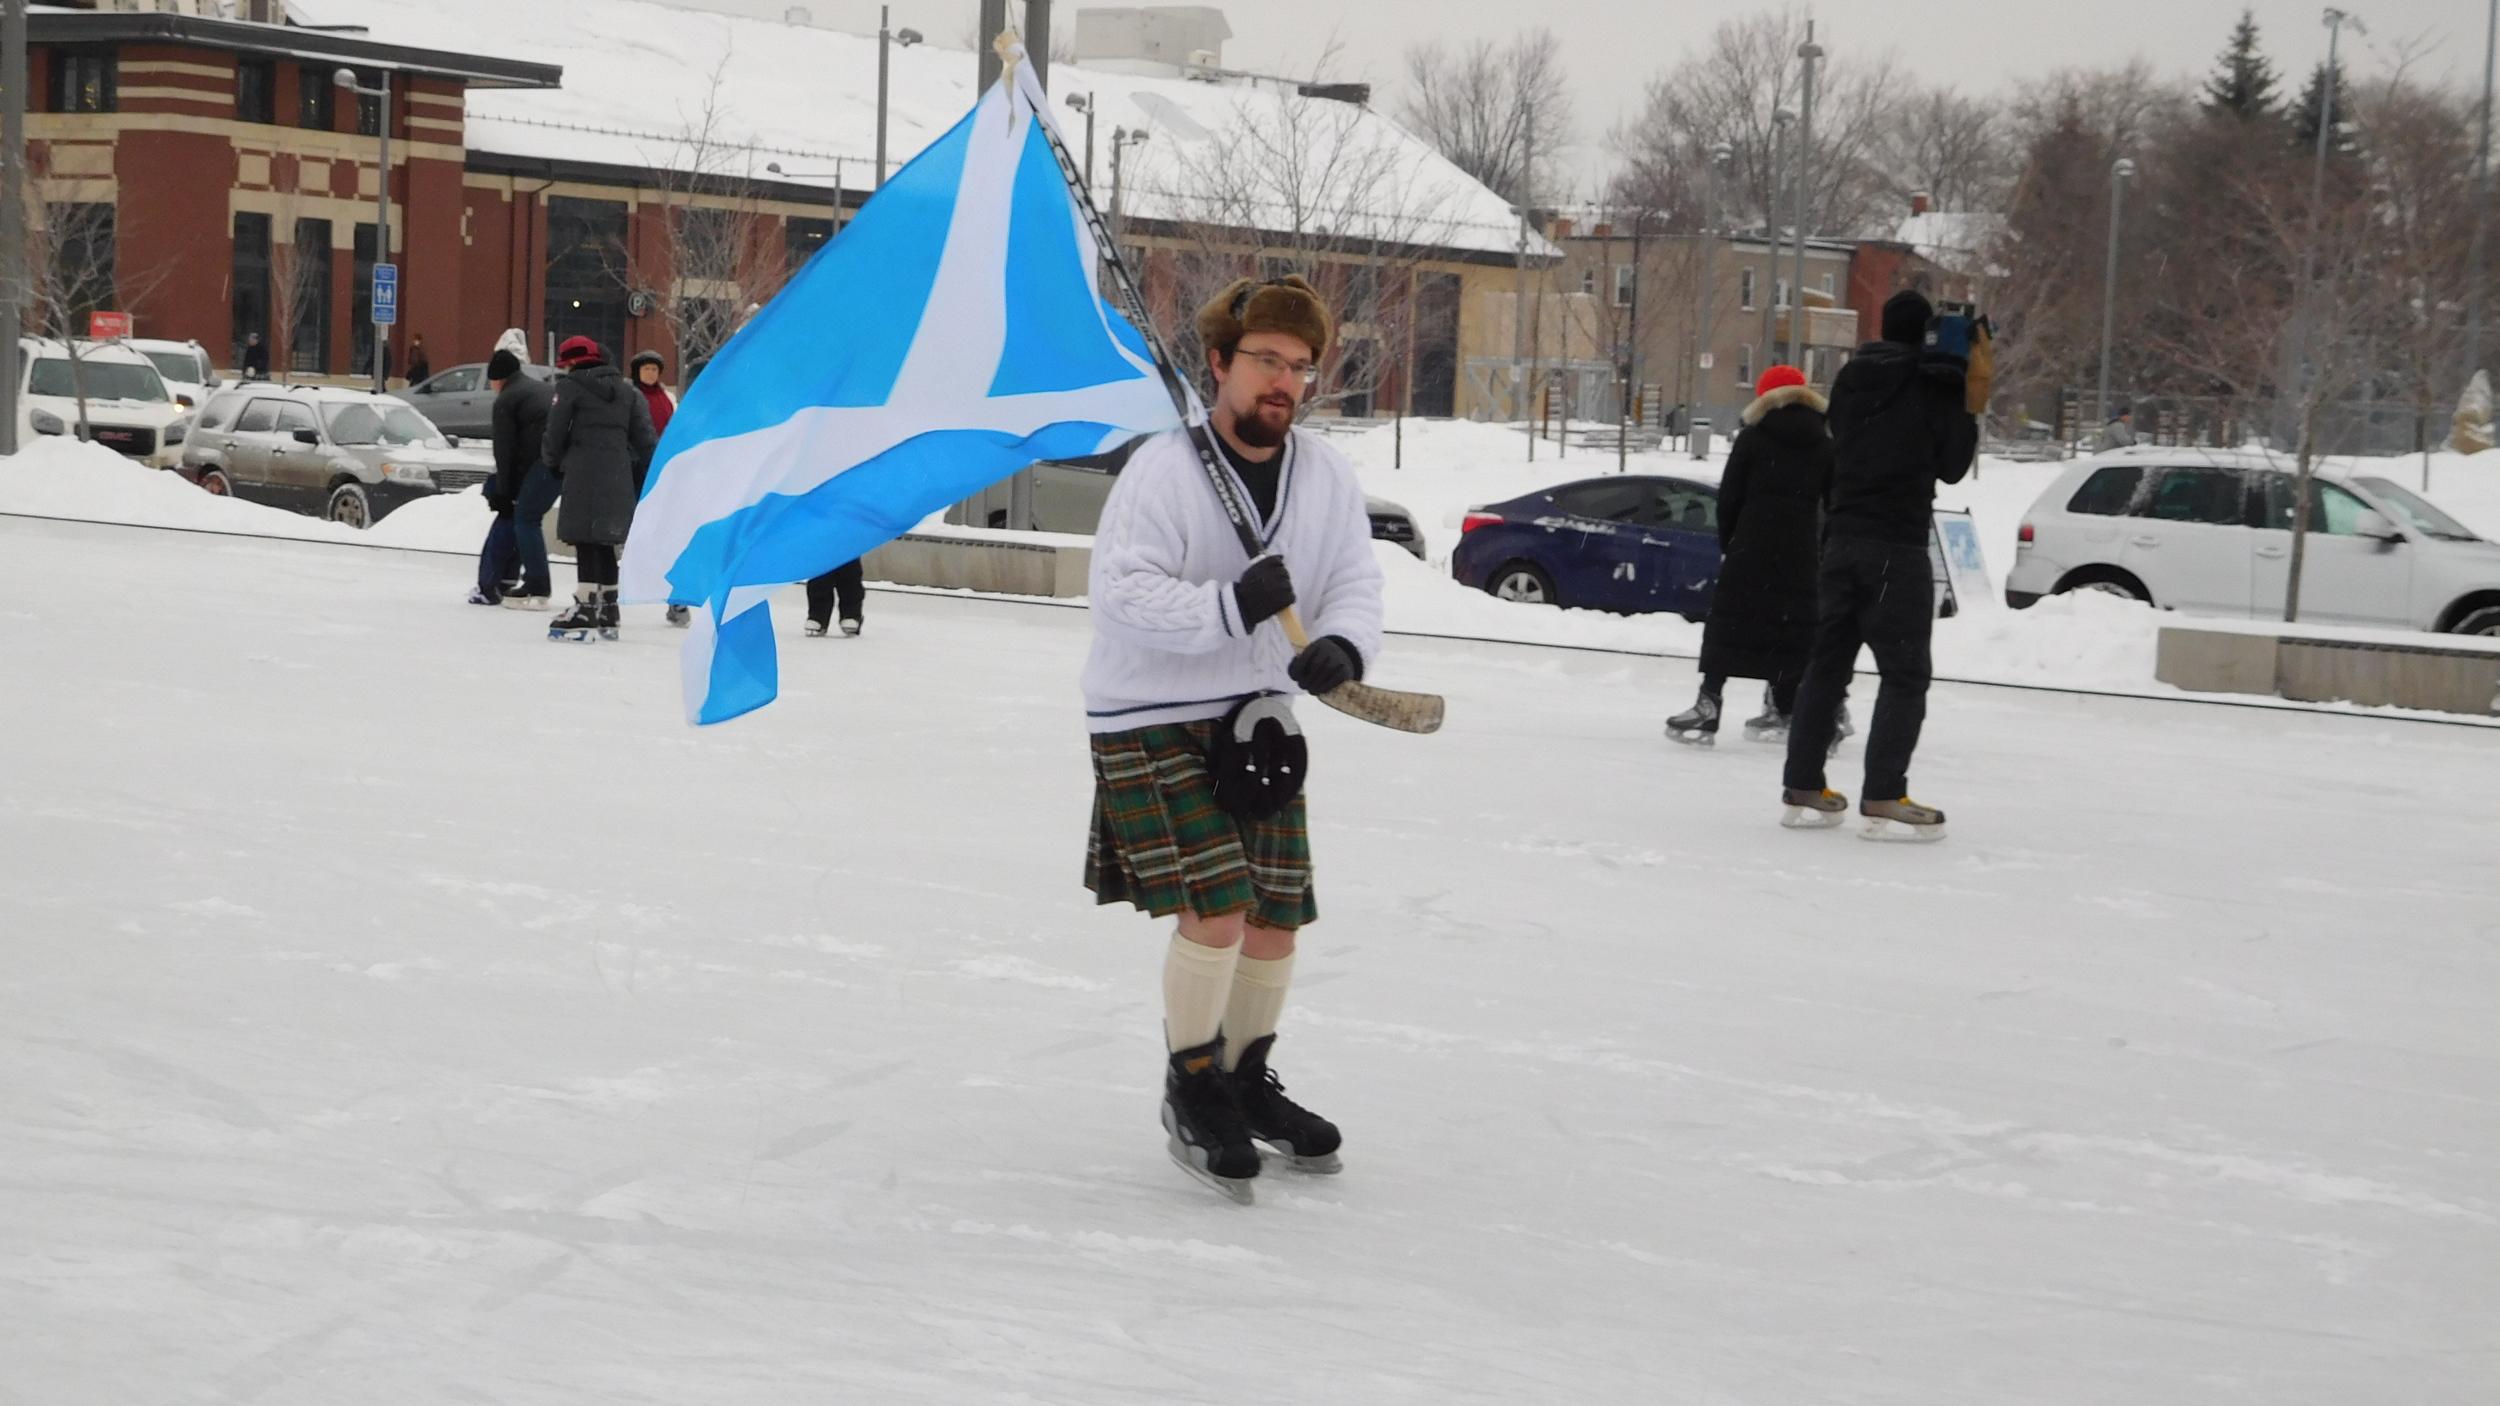 The hockey-stick saltire: symbol of Sir John A's Great Canadian Kilt Skate.